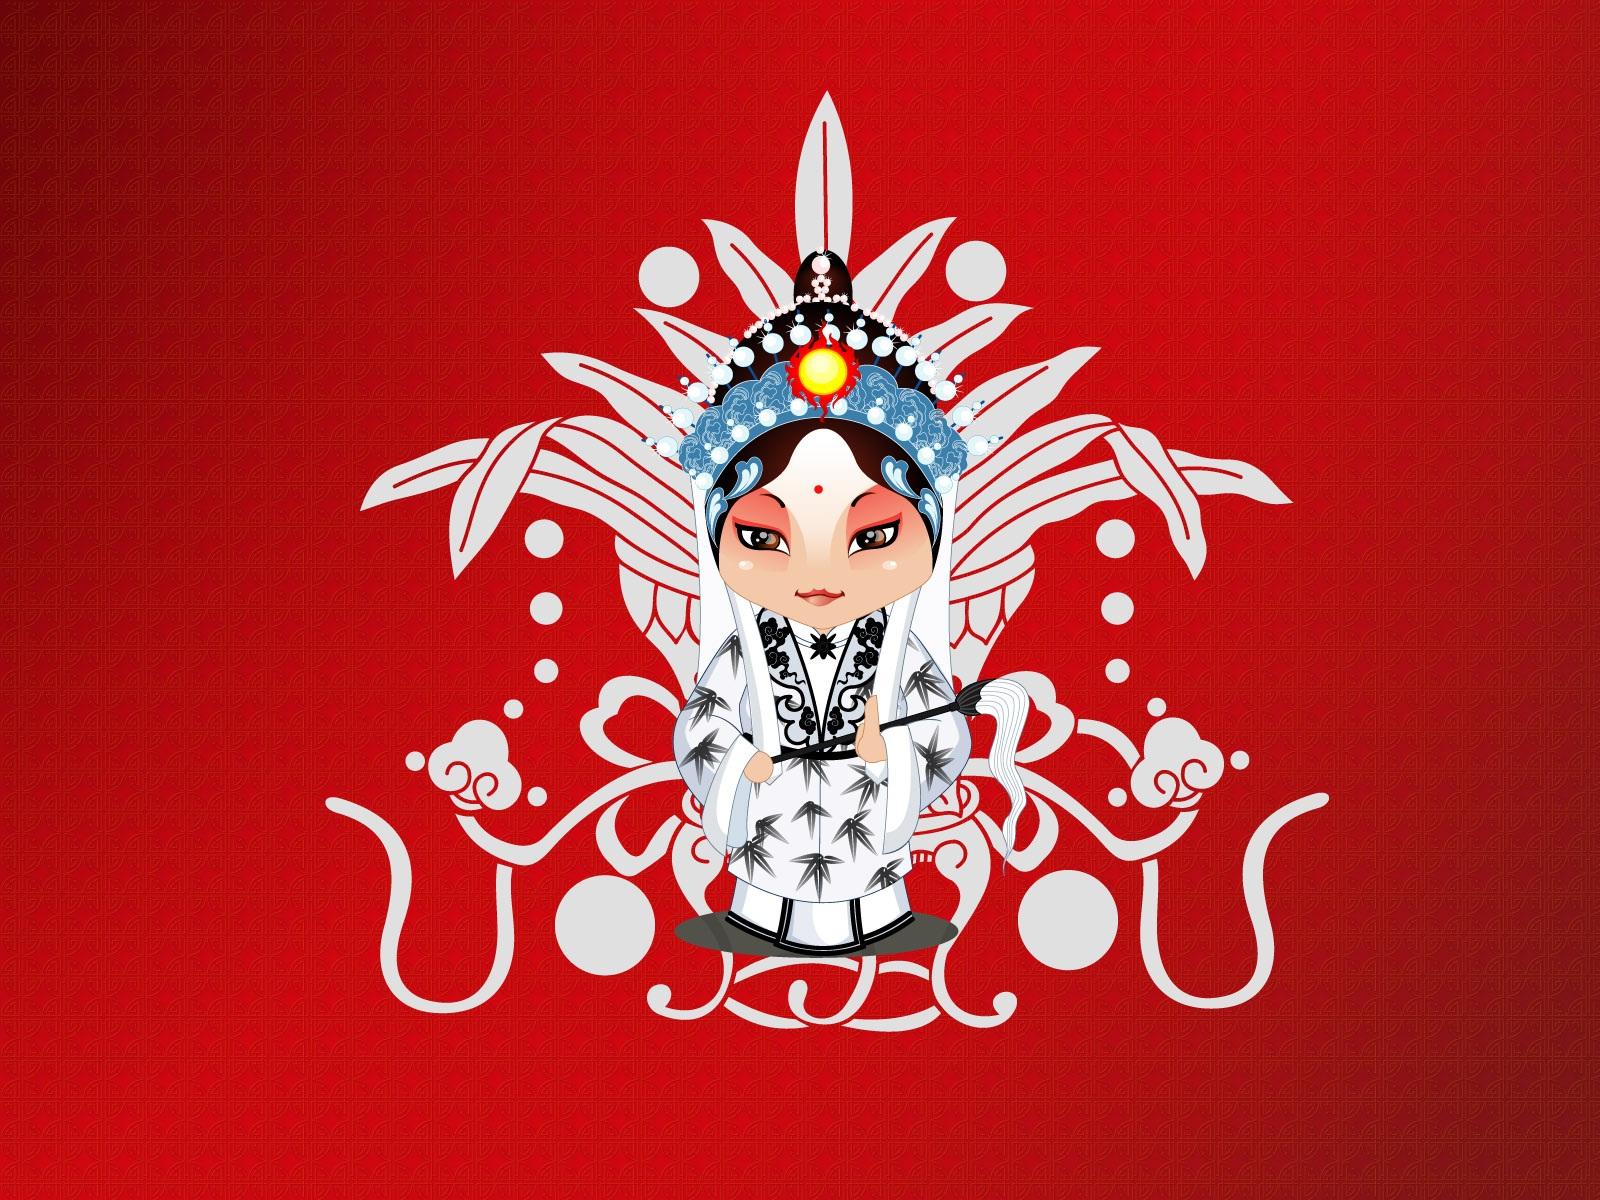 http://2.bp.blogspot.com/-VOL7-JhXHI4/T5JgodJNa1I/AAAAAAAAAKU/TSdBl3RPWSE/s1600/Beijing+Opera14.jpg